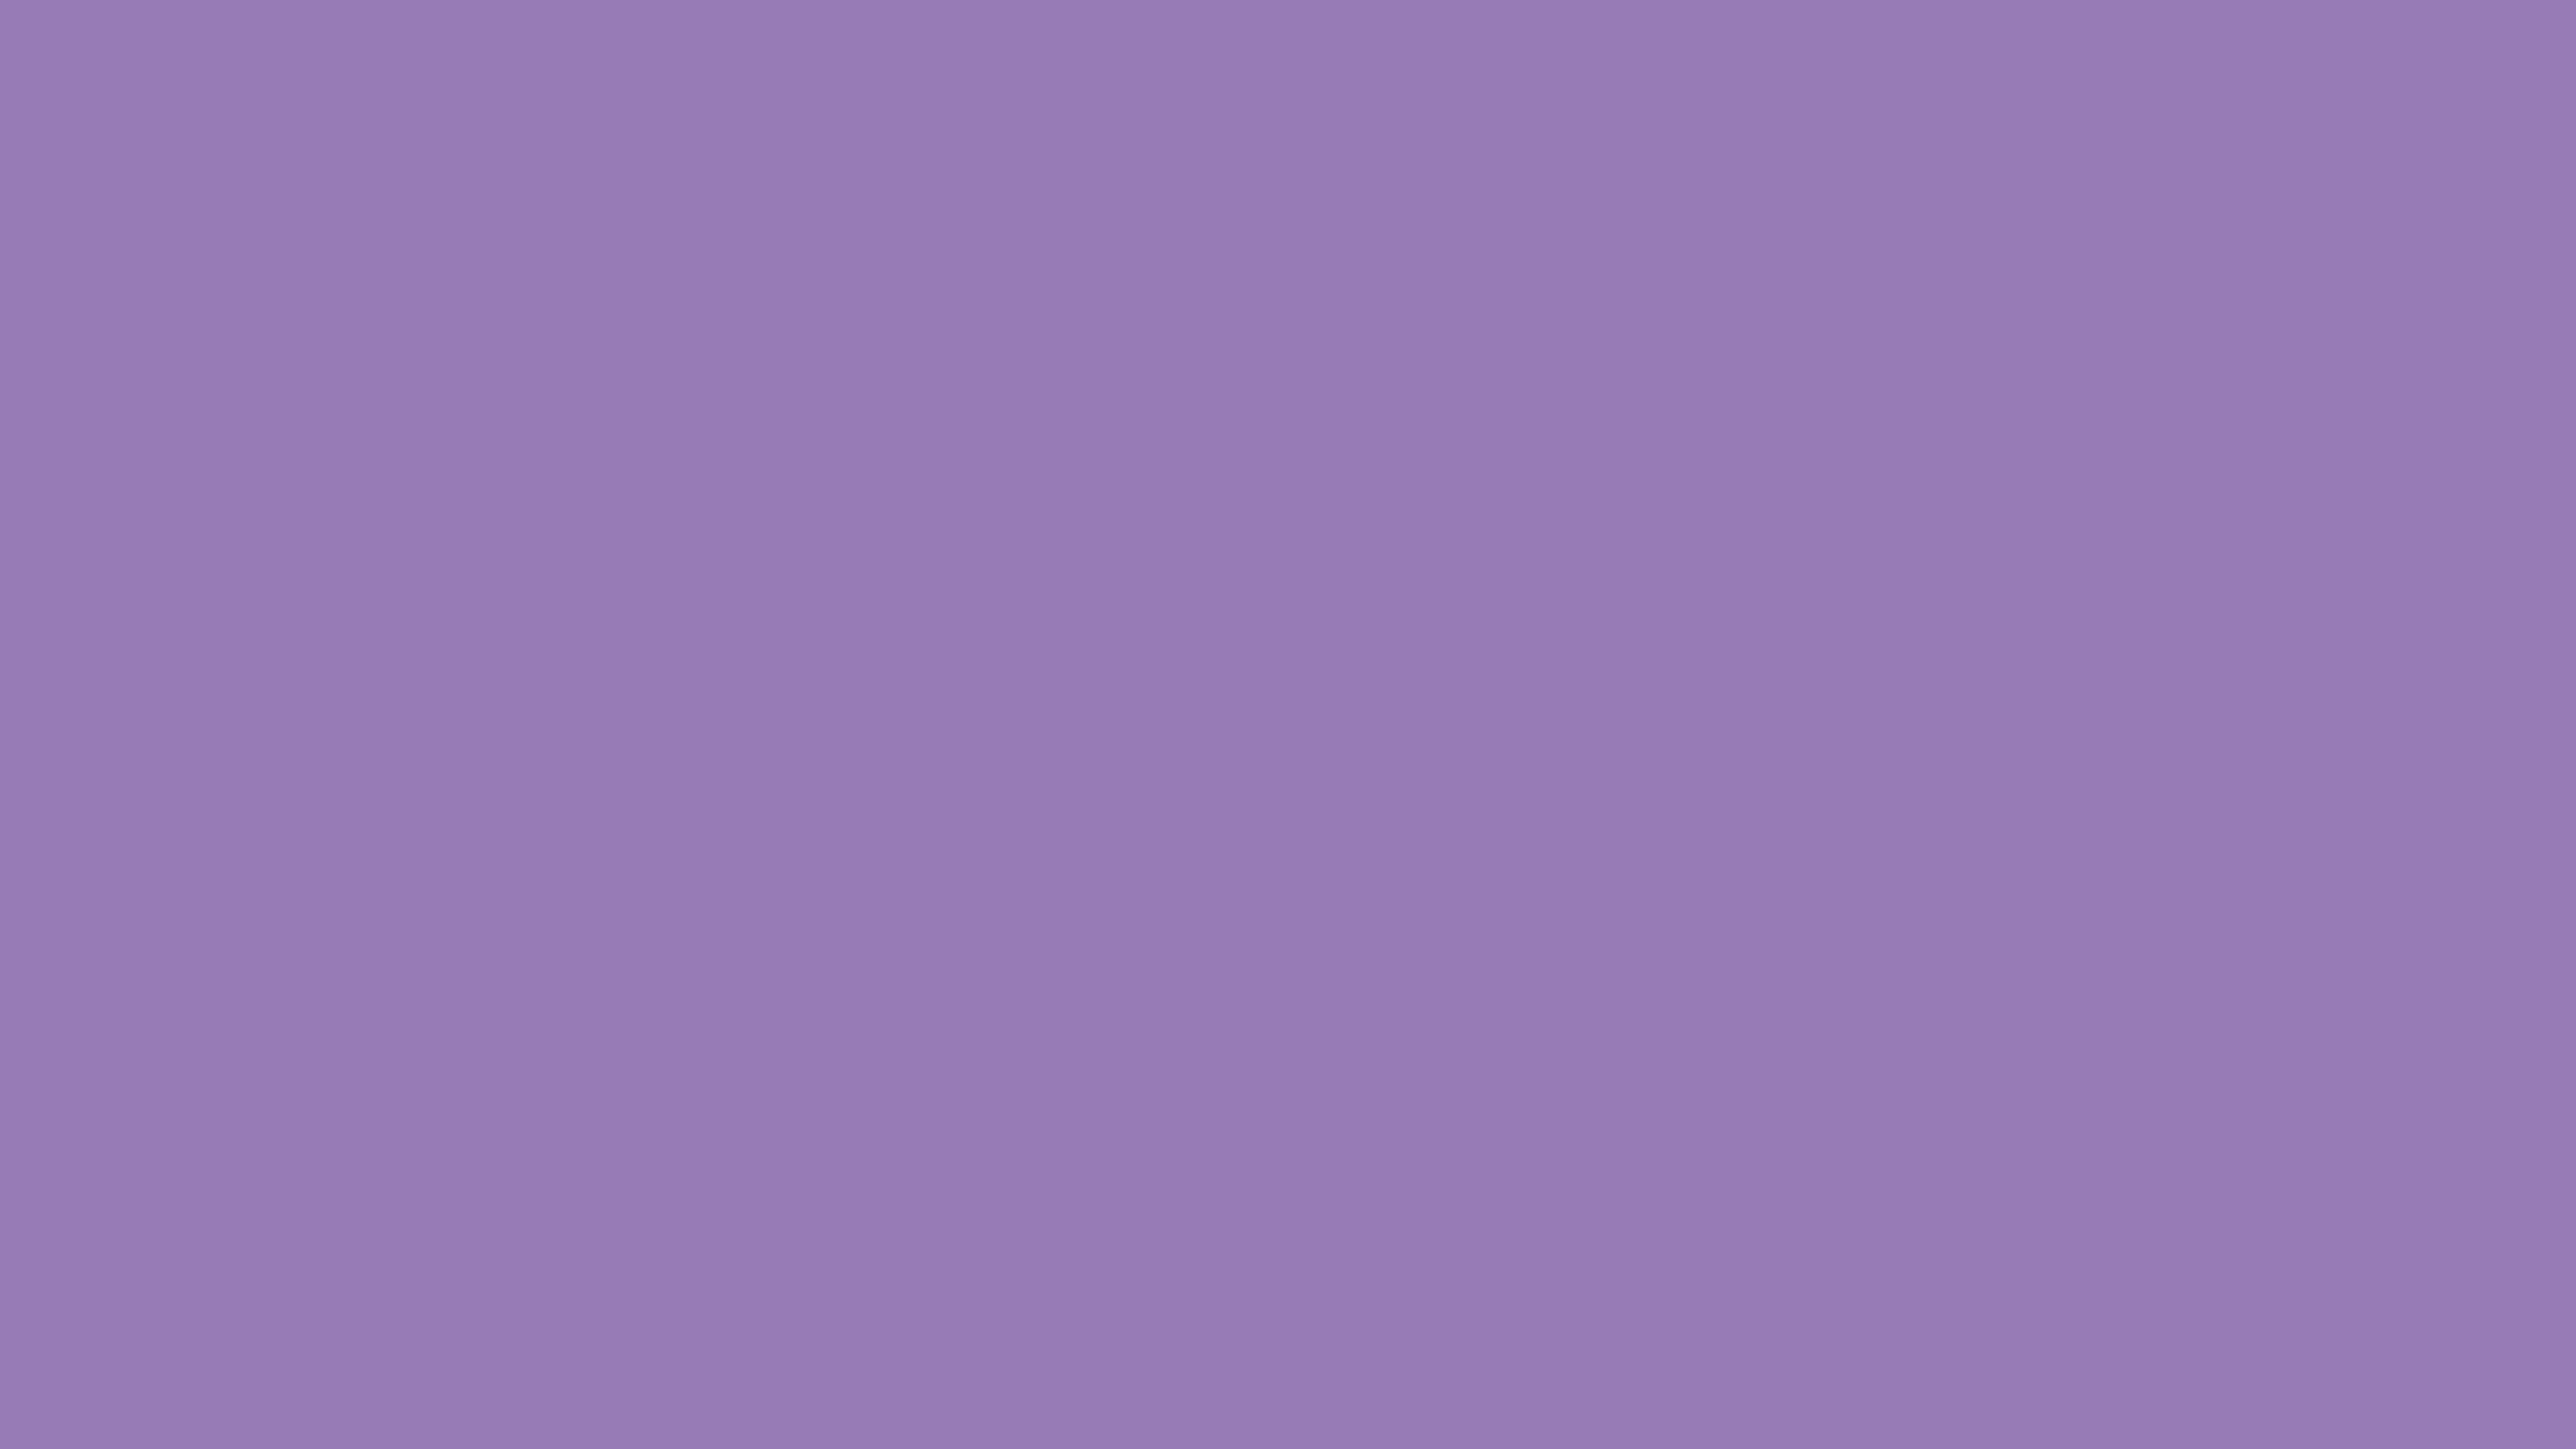 4096x2304 Lavender Purple Solid Color Background